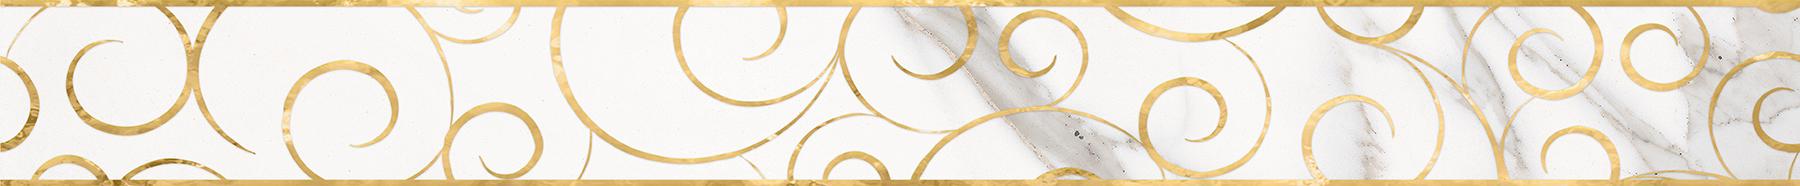 Миланезе дизайн Бордюр Флорал каррара 1506-0154 6х60 бордюр настенный 6х60 3 миланезе дизайн флорал крема